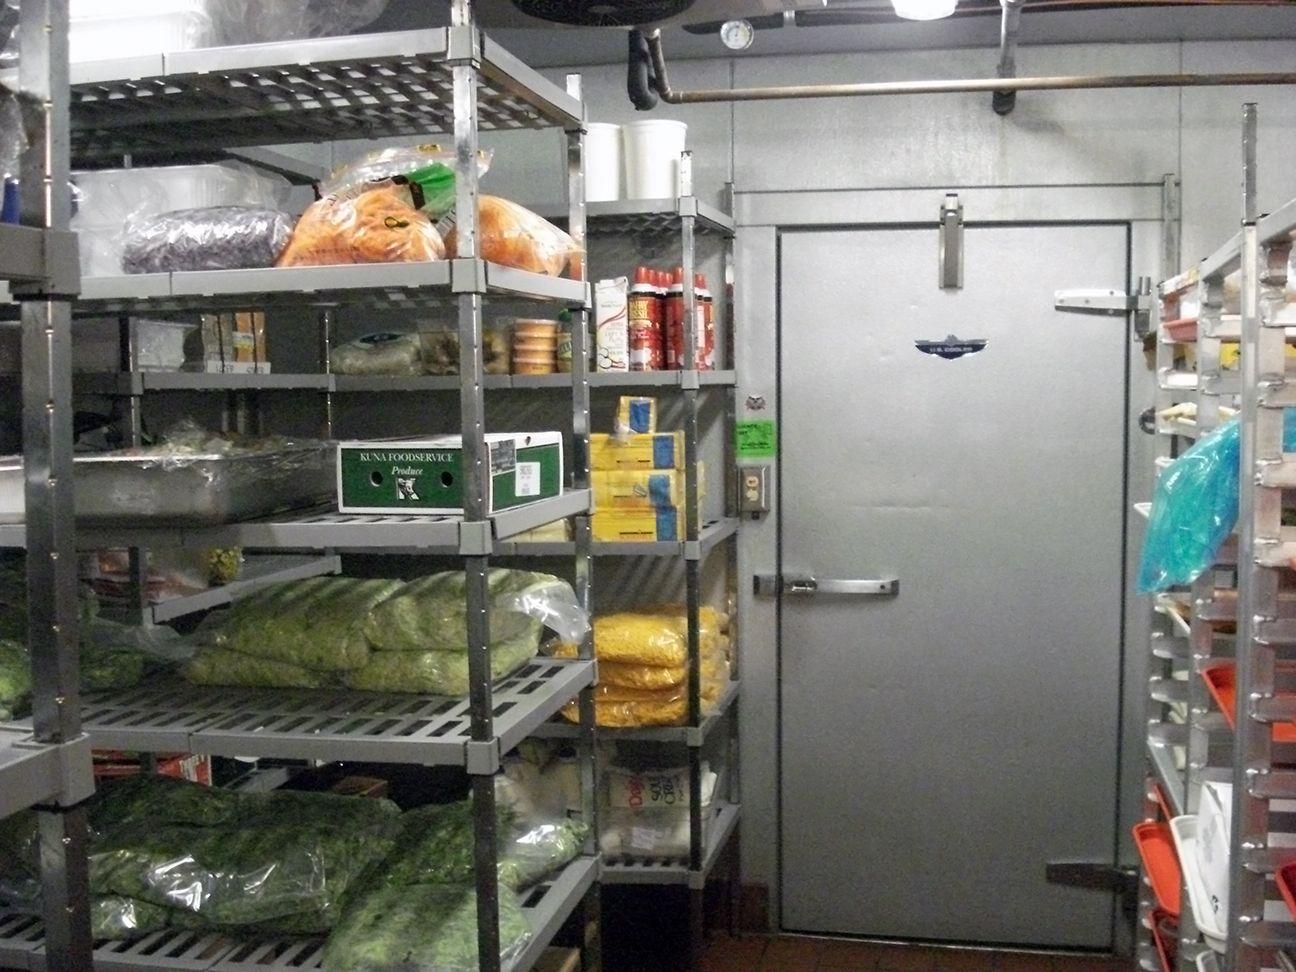 J J Refrigeration Provides Full Service Commercial Refrigeration Design Sales Installation Repair Optimizati Walk In Freezer Refrigerator Kitchen Stocked